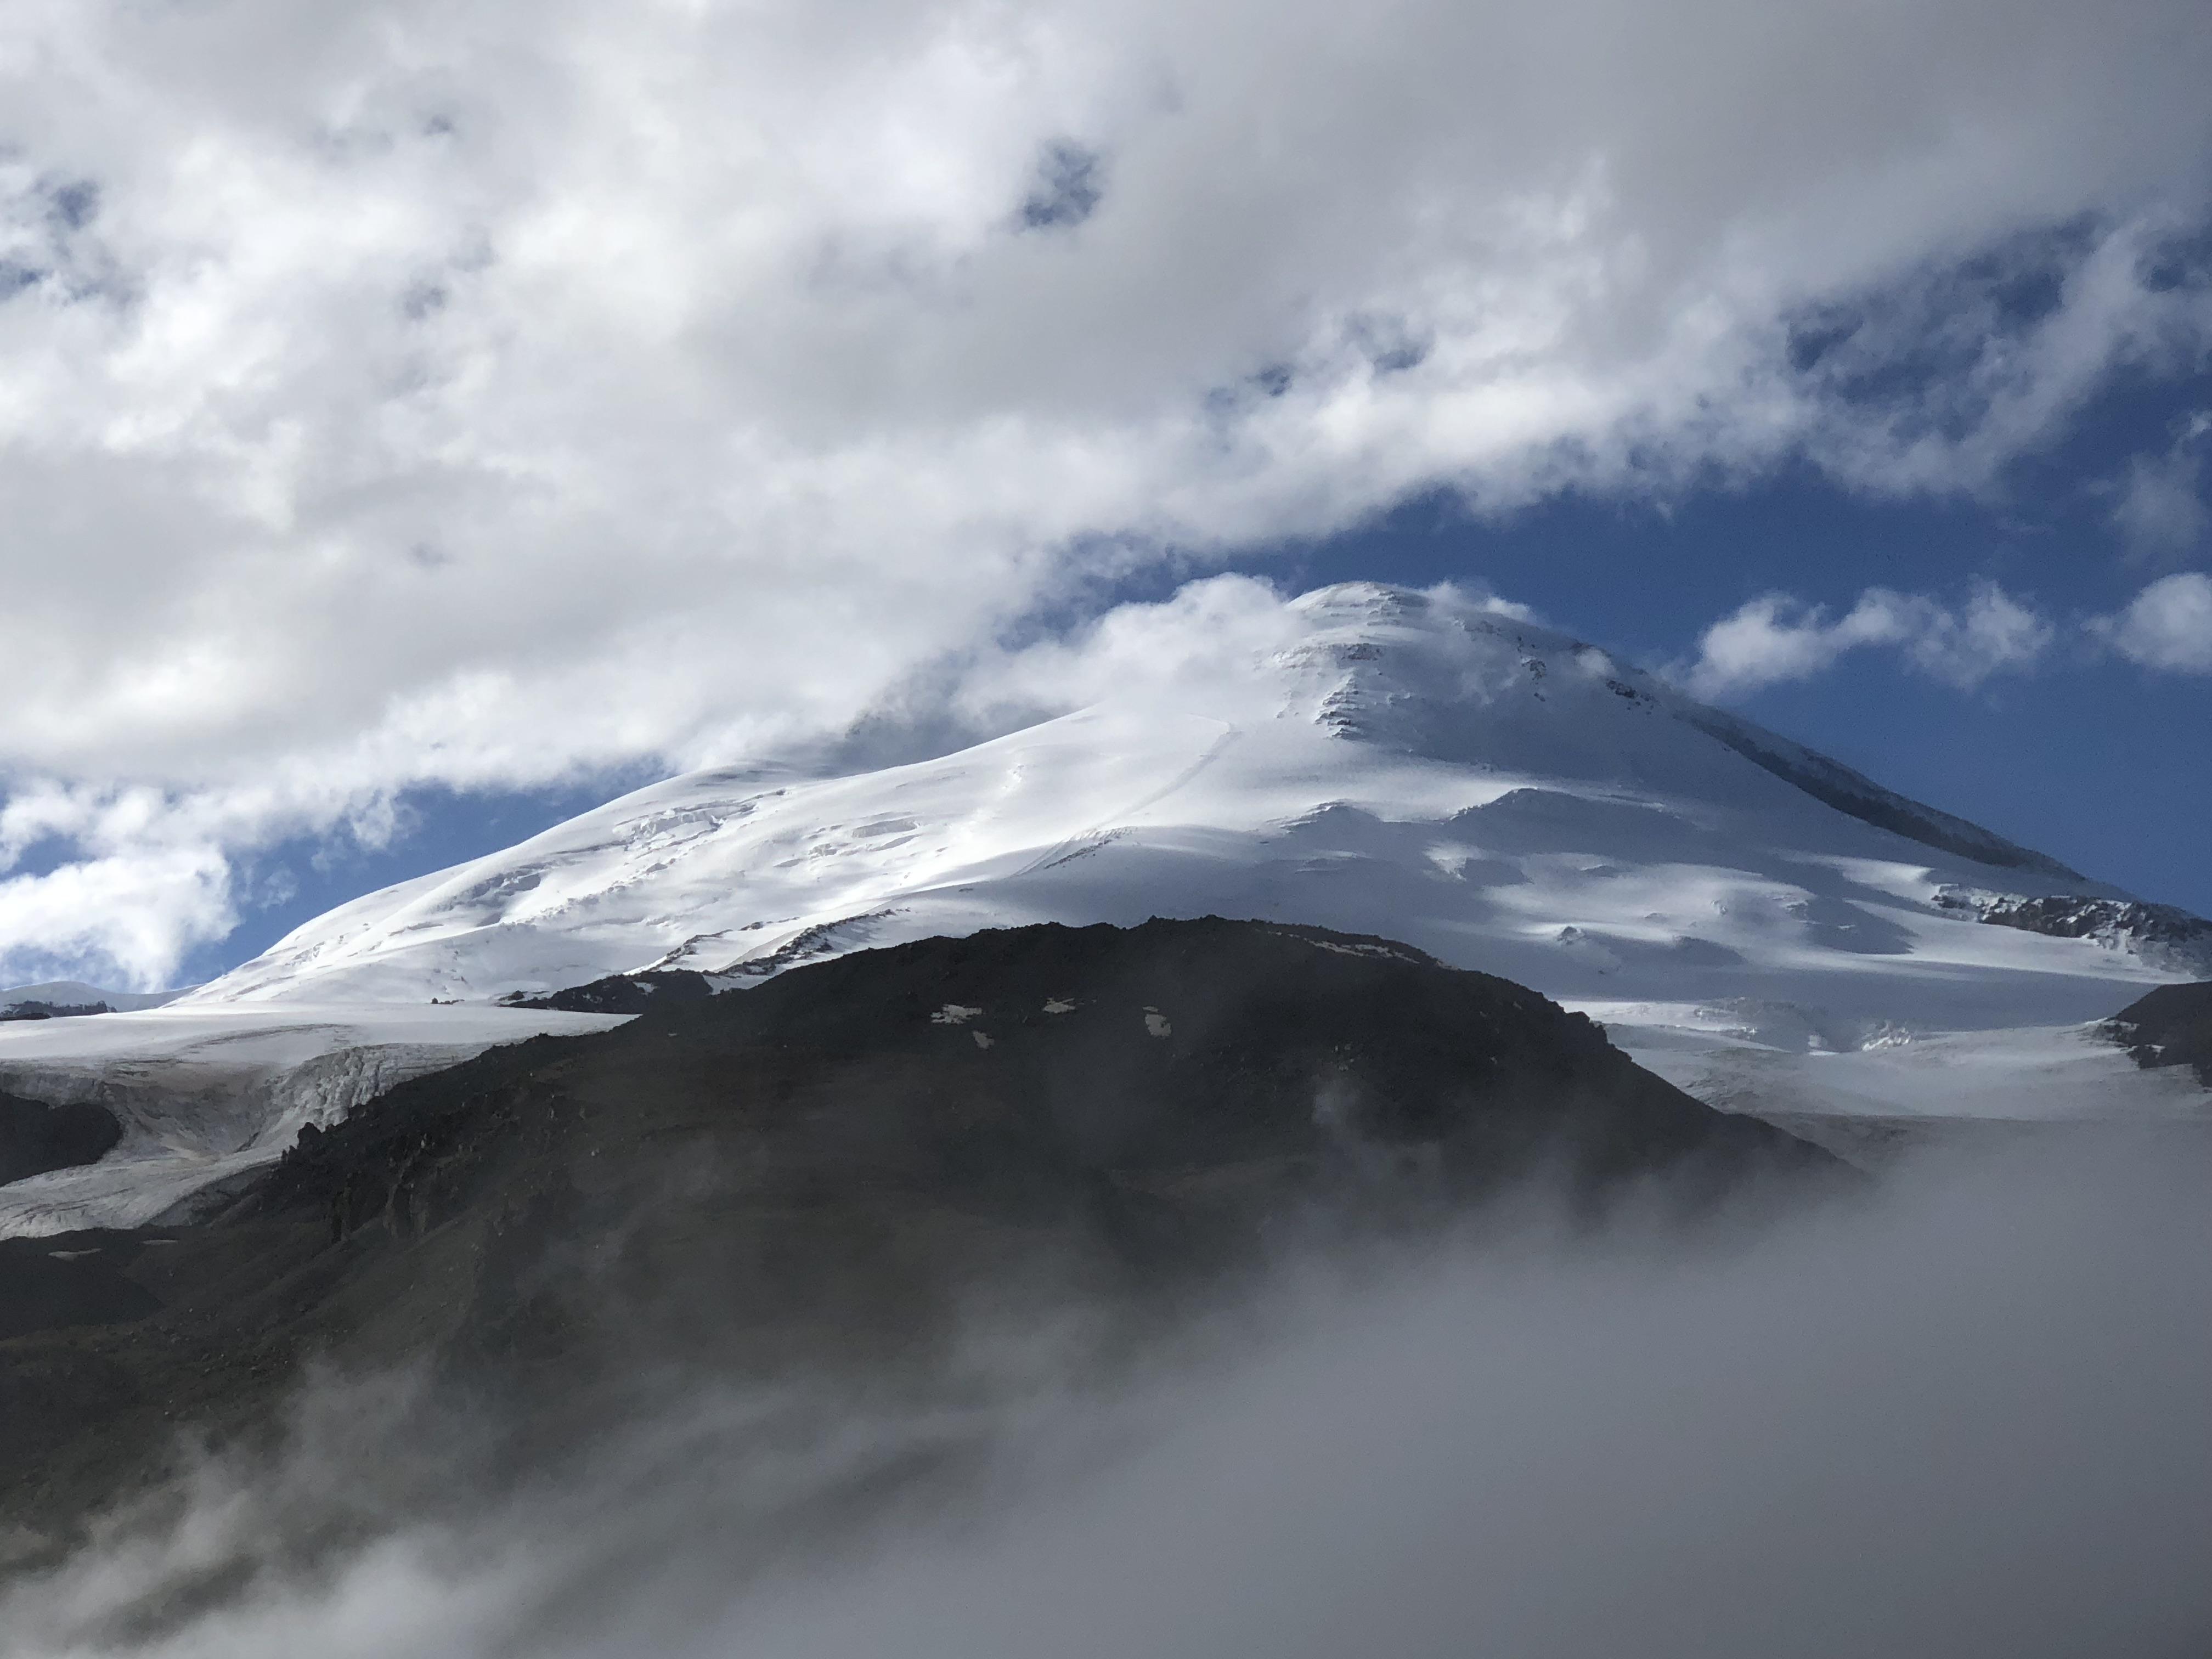 Mächtige Berge